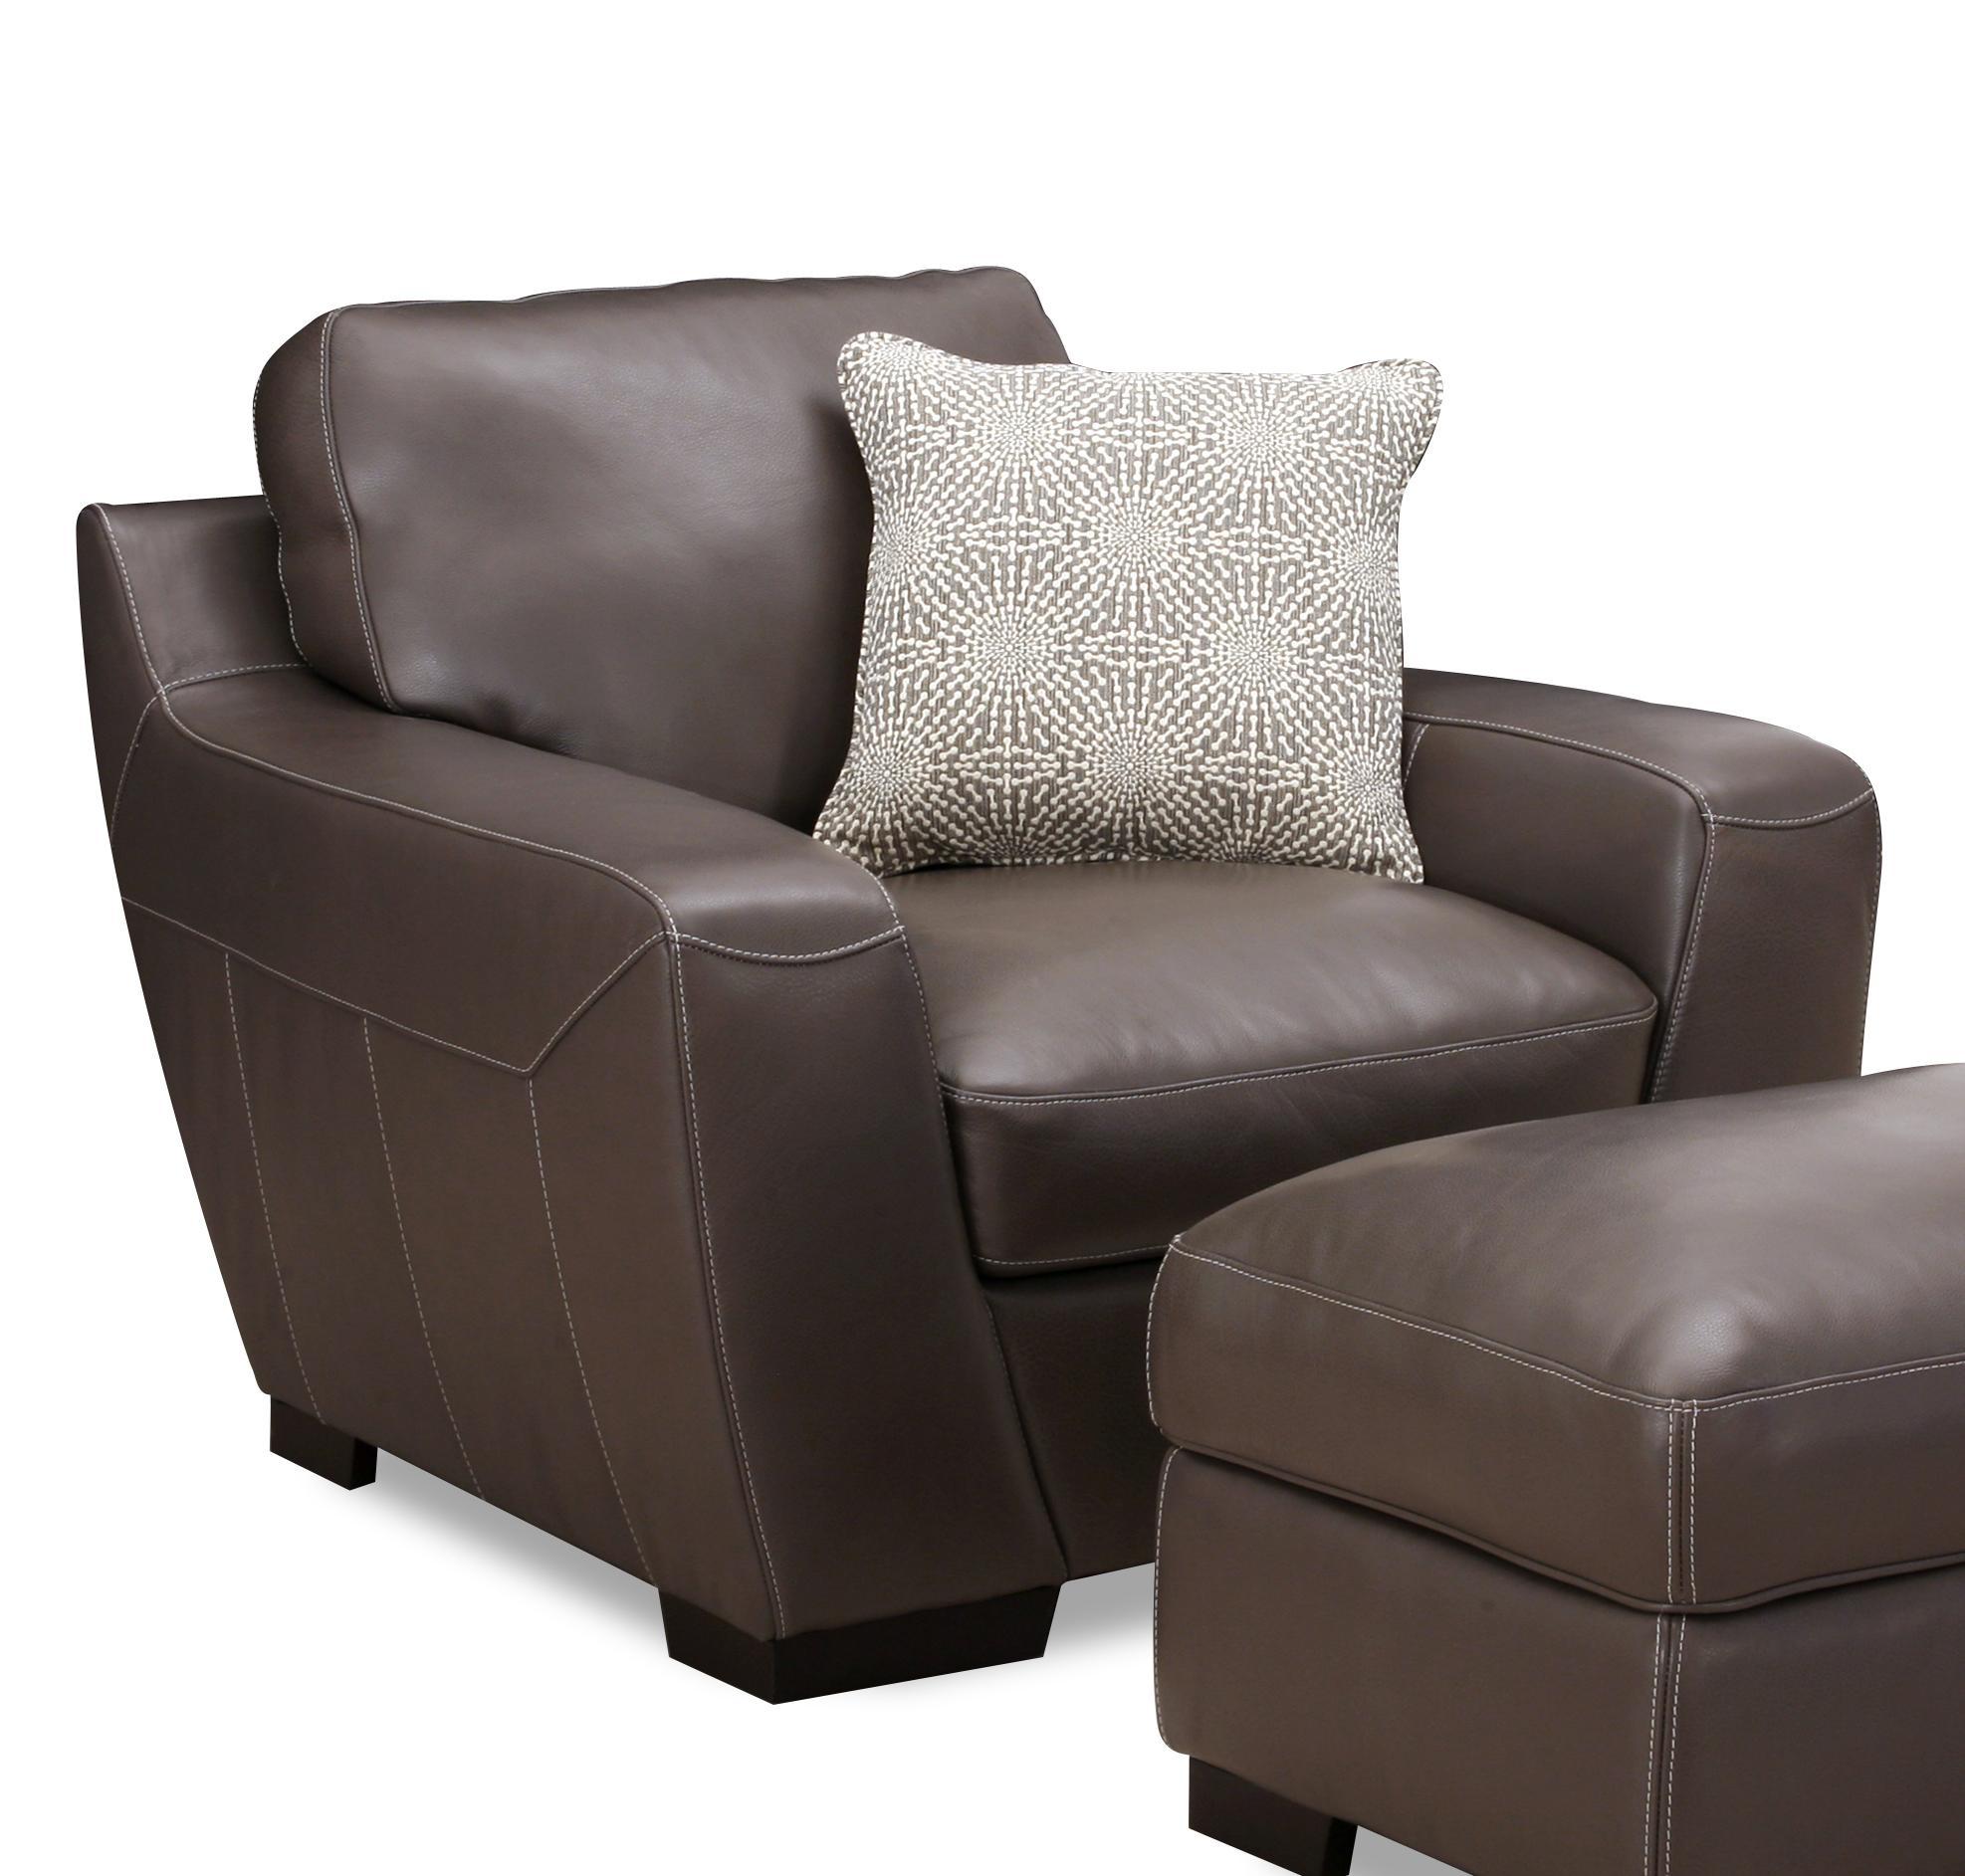 Alpha Leather Match Chair by Simon Li at Dean Bosler's